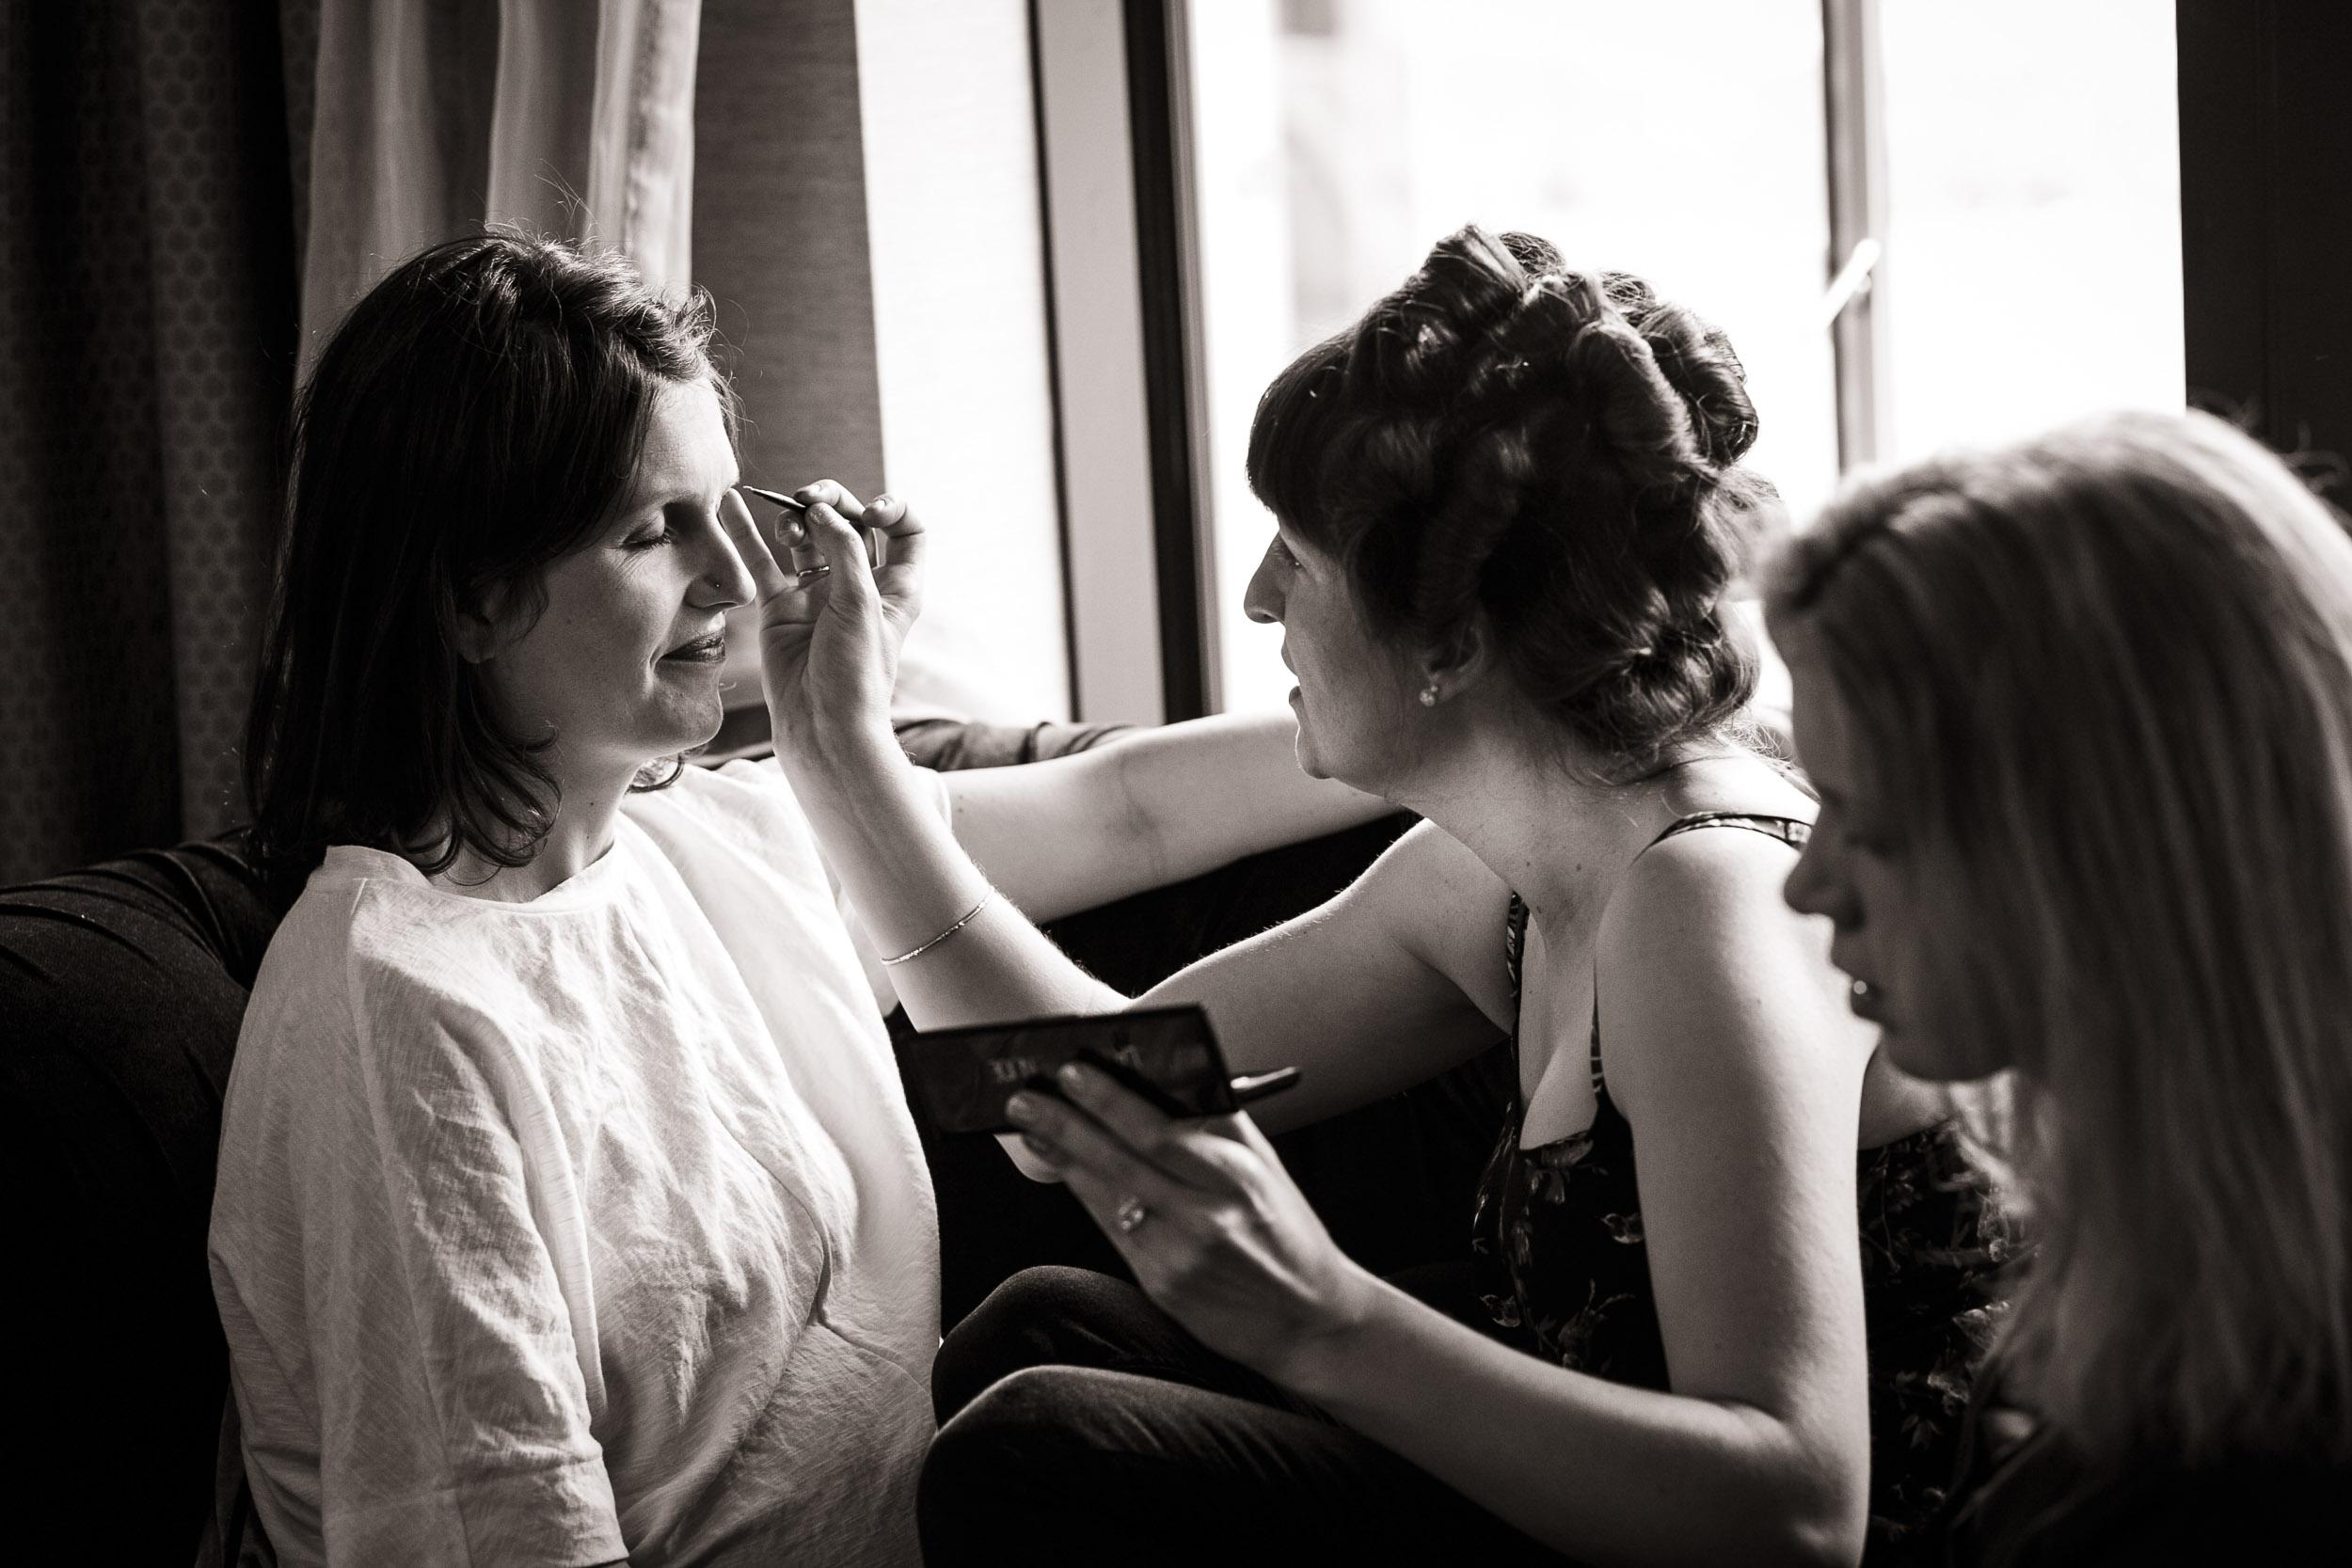 syon-house-wedding-photographer-london 009.jpg